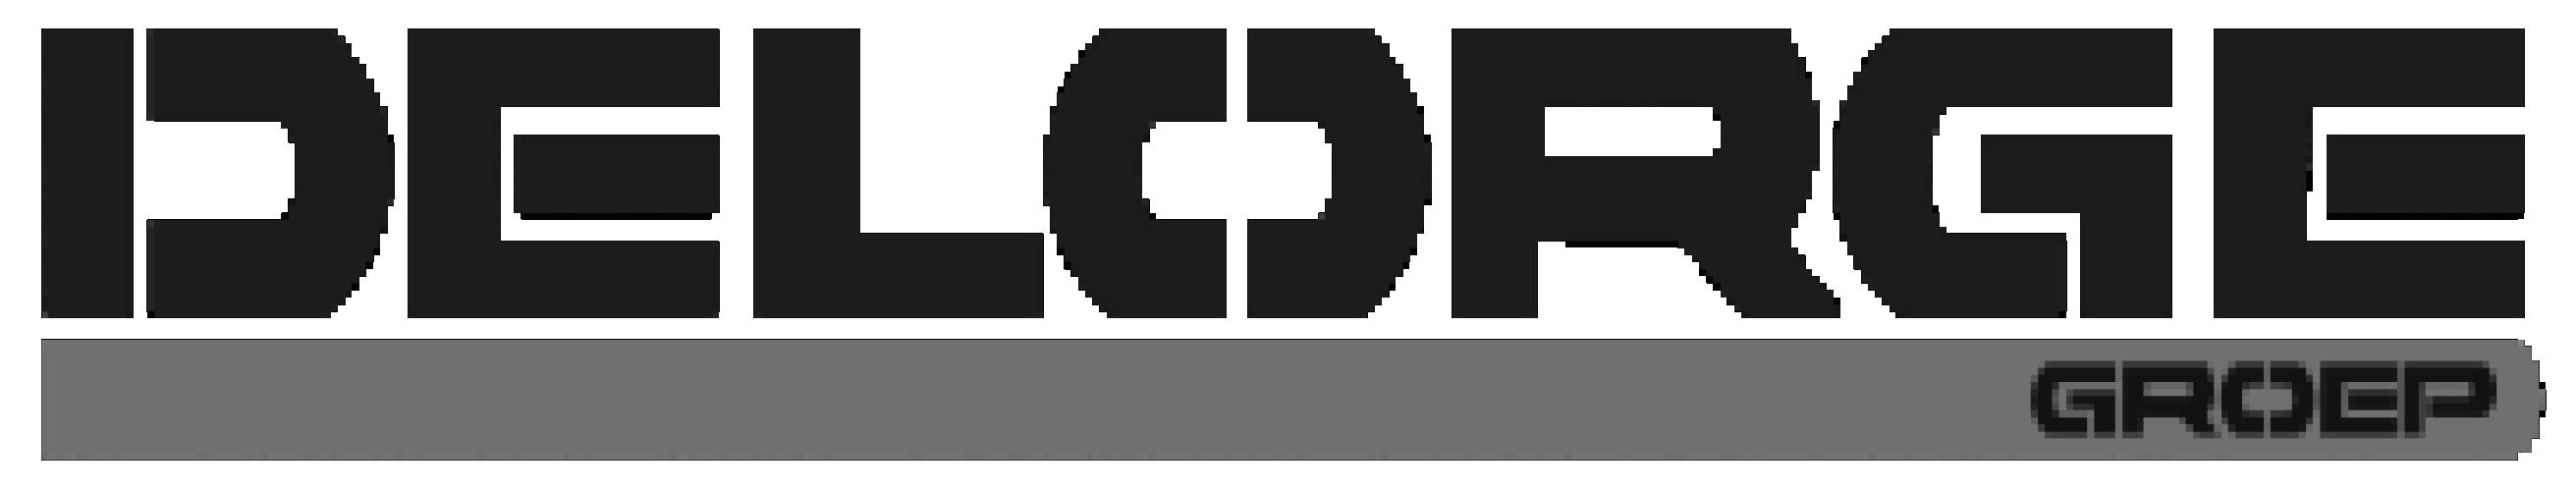 Logo klant van White Light: Group Delorge